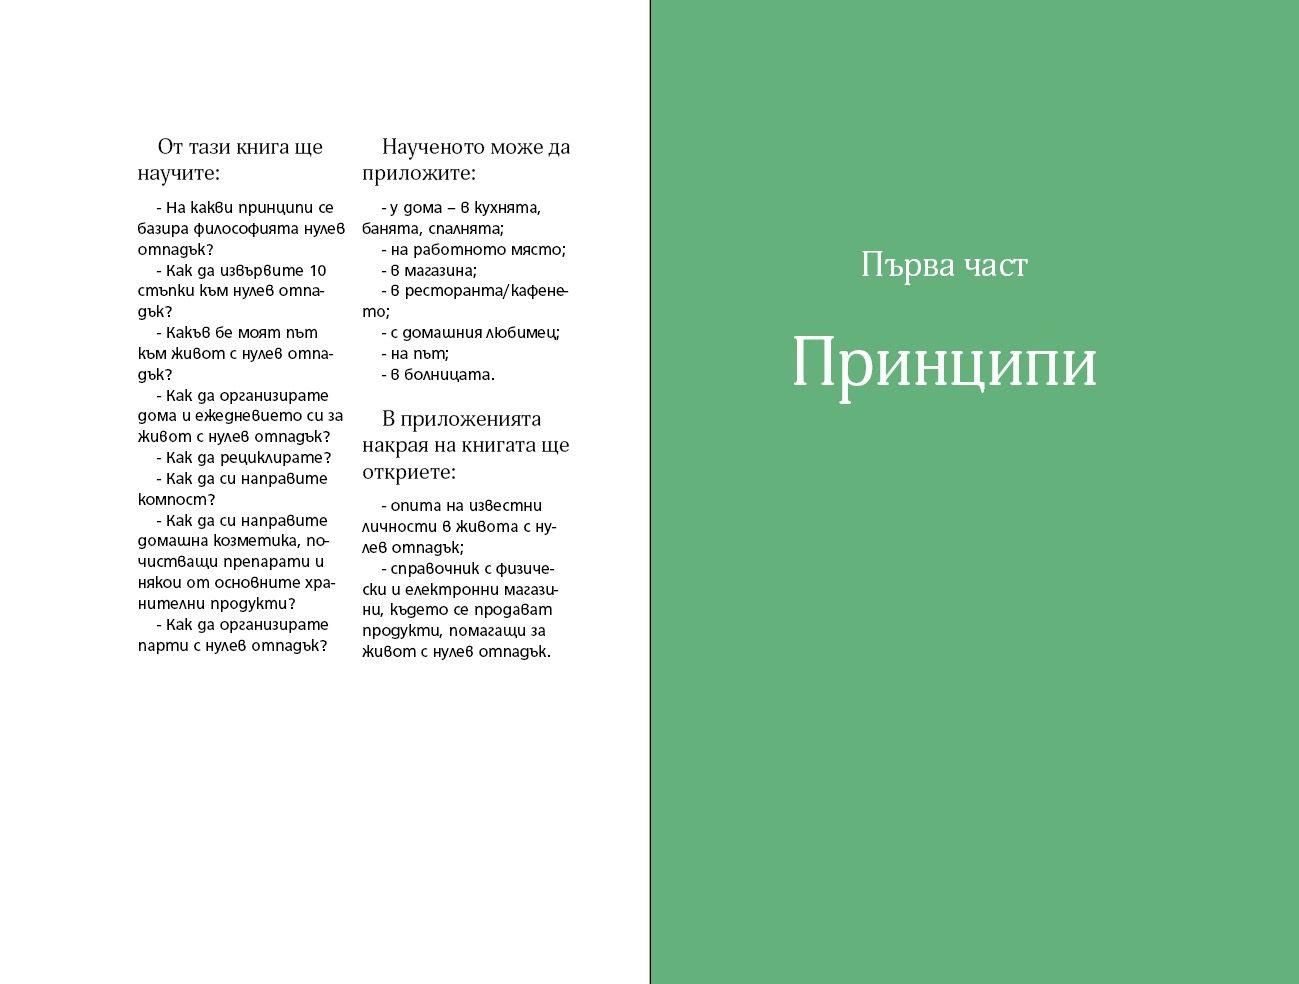 Живот с нулев отпадък в България - 5